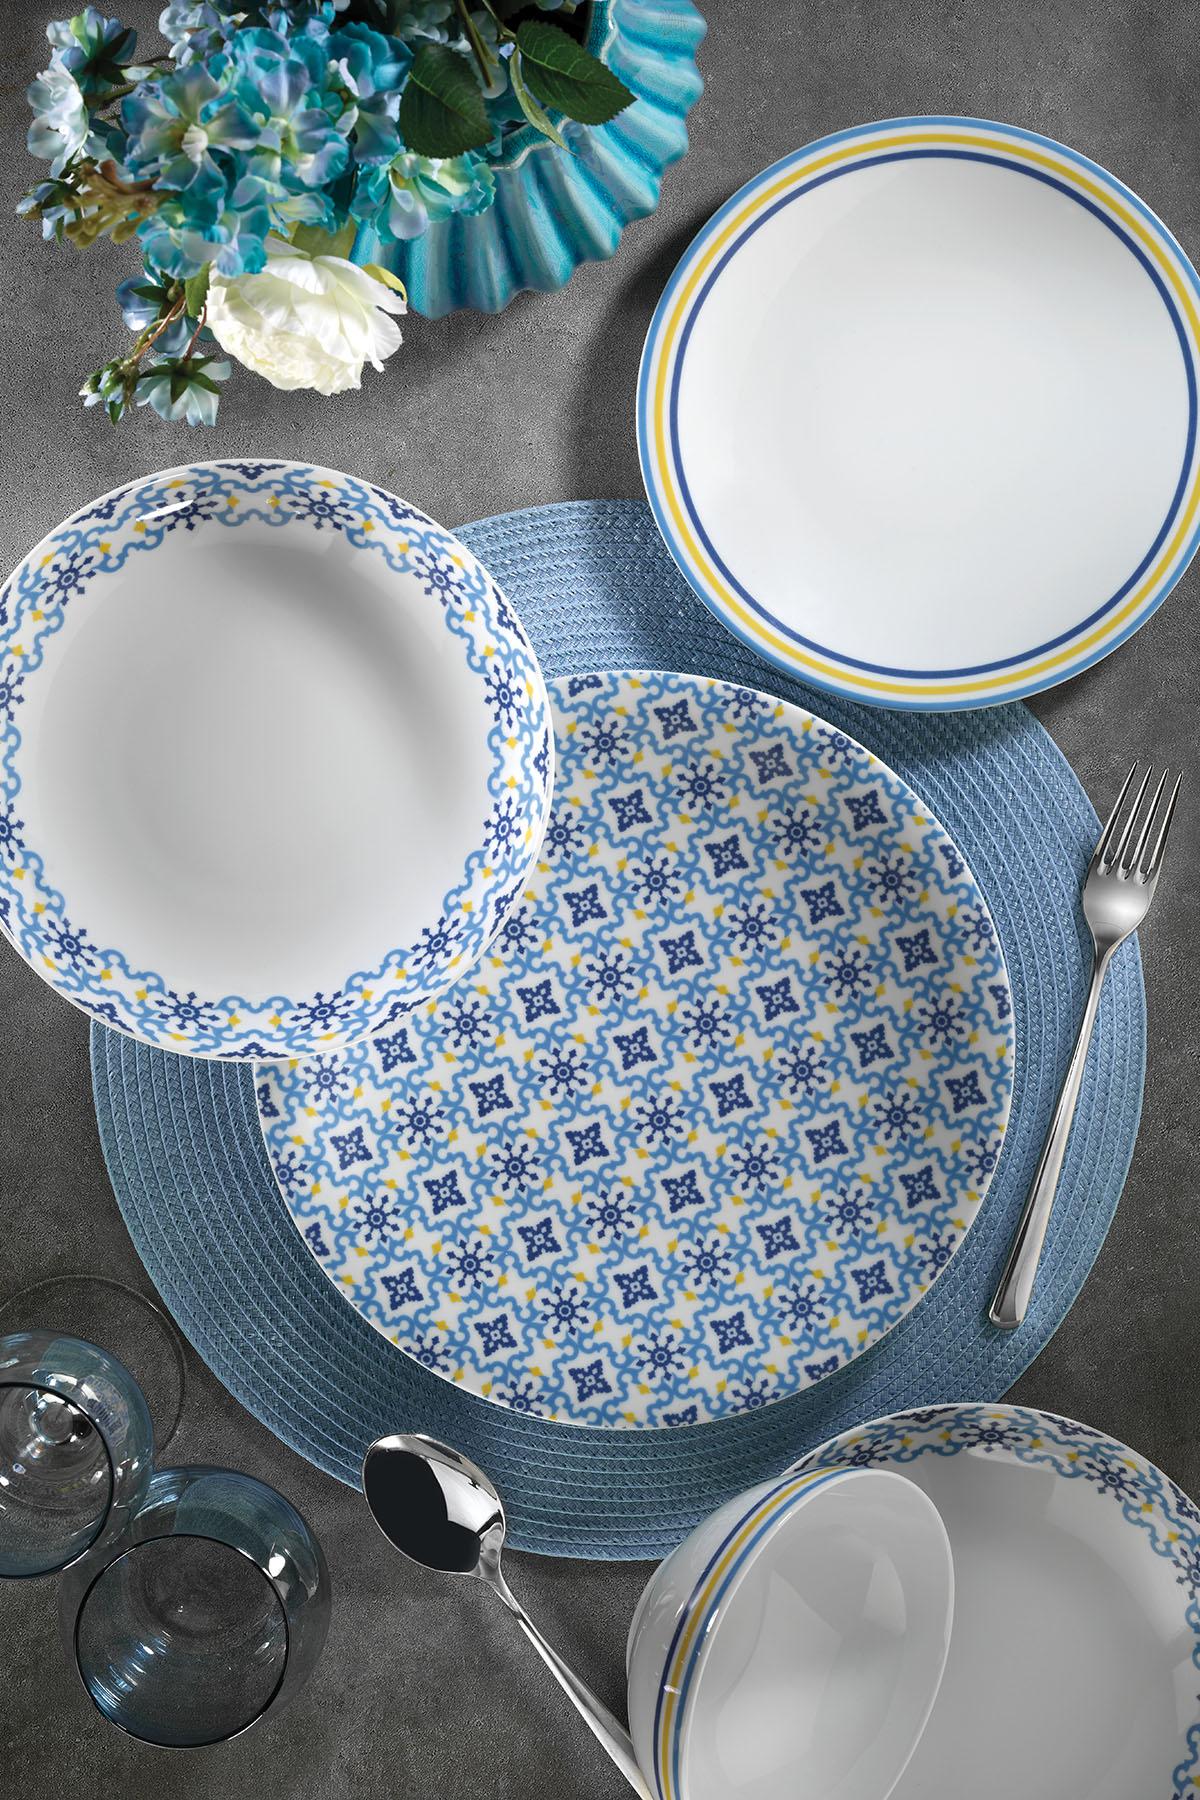 Kütahya Porselen - Kütahya Porselen 9993 Desen 24 Parça Yemek Seti